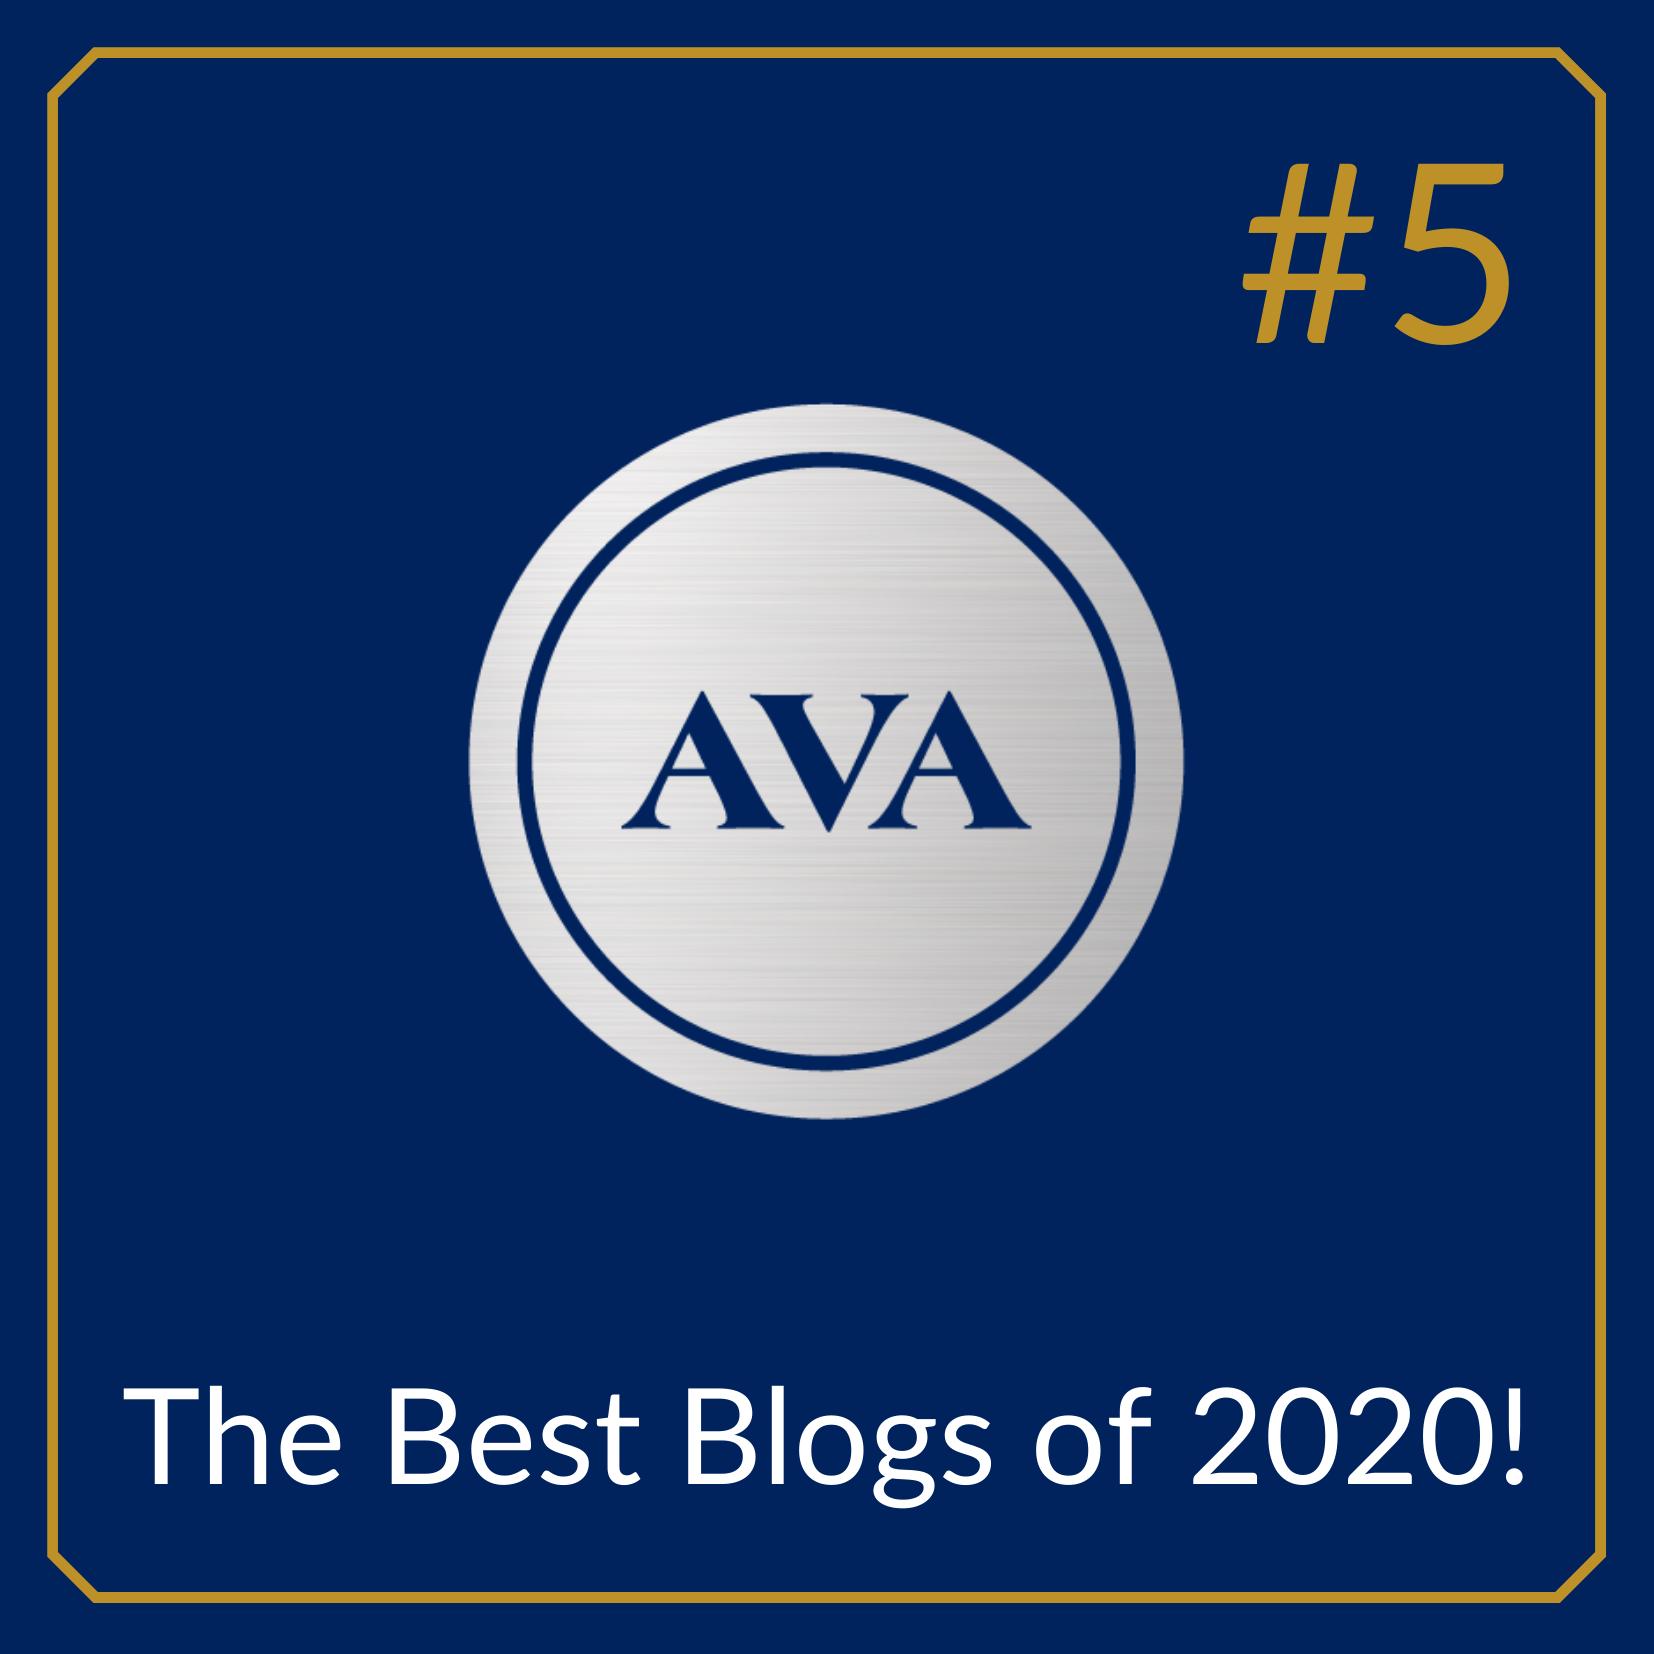 Best Blog 5